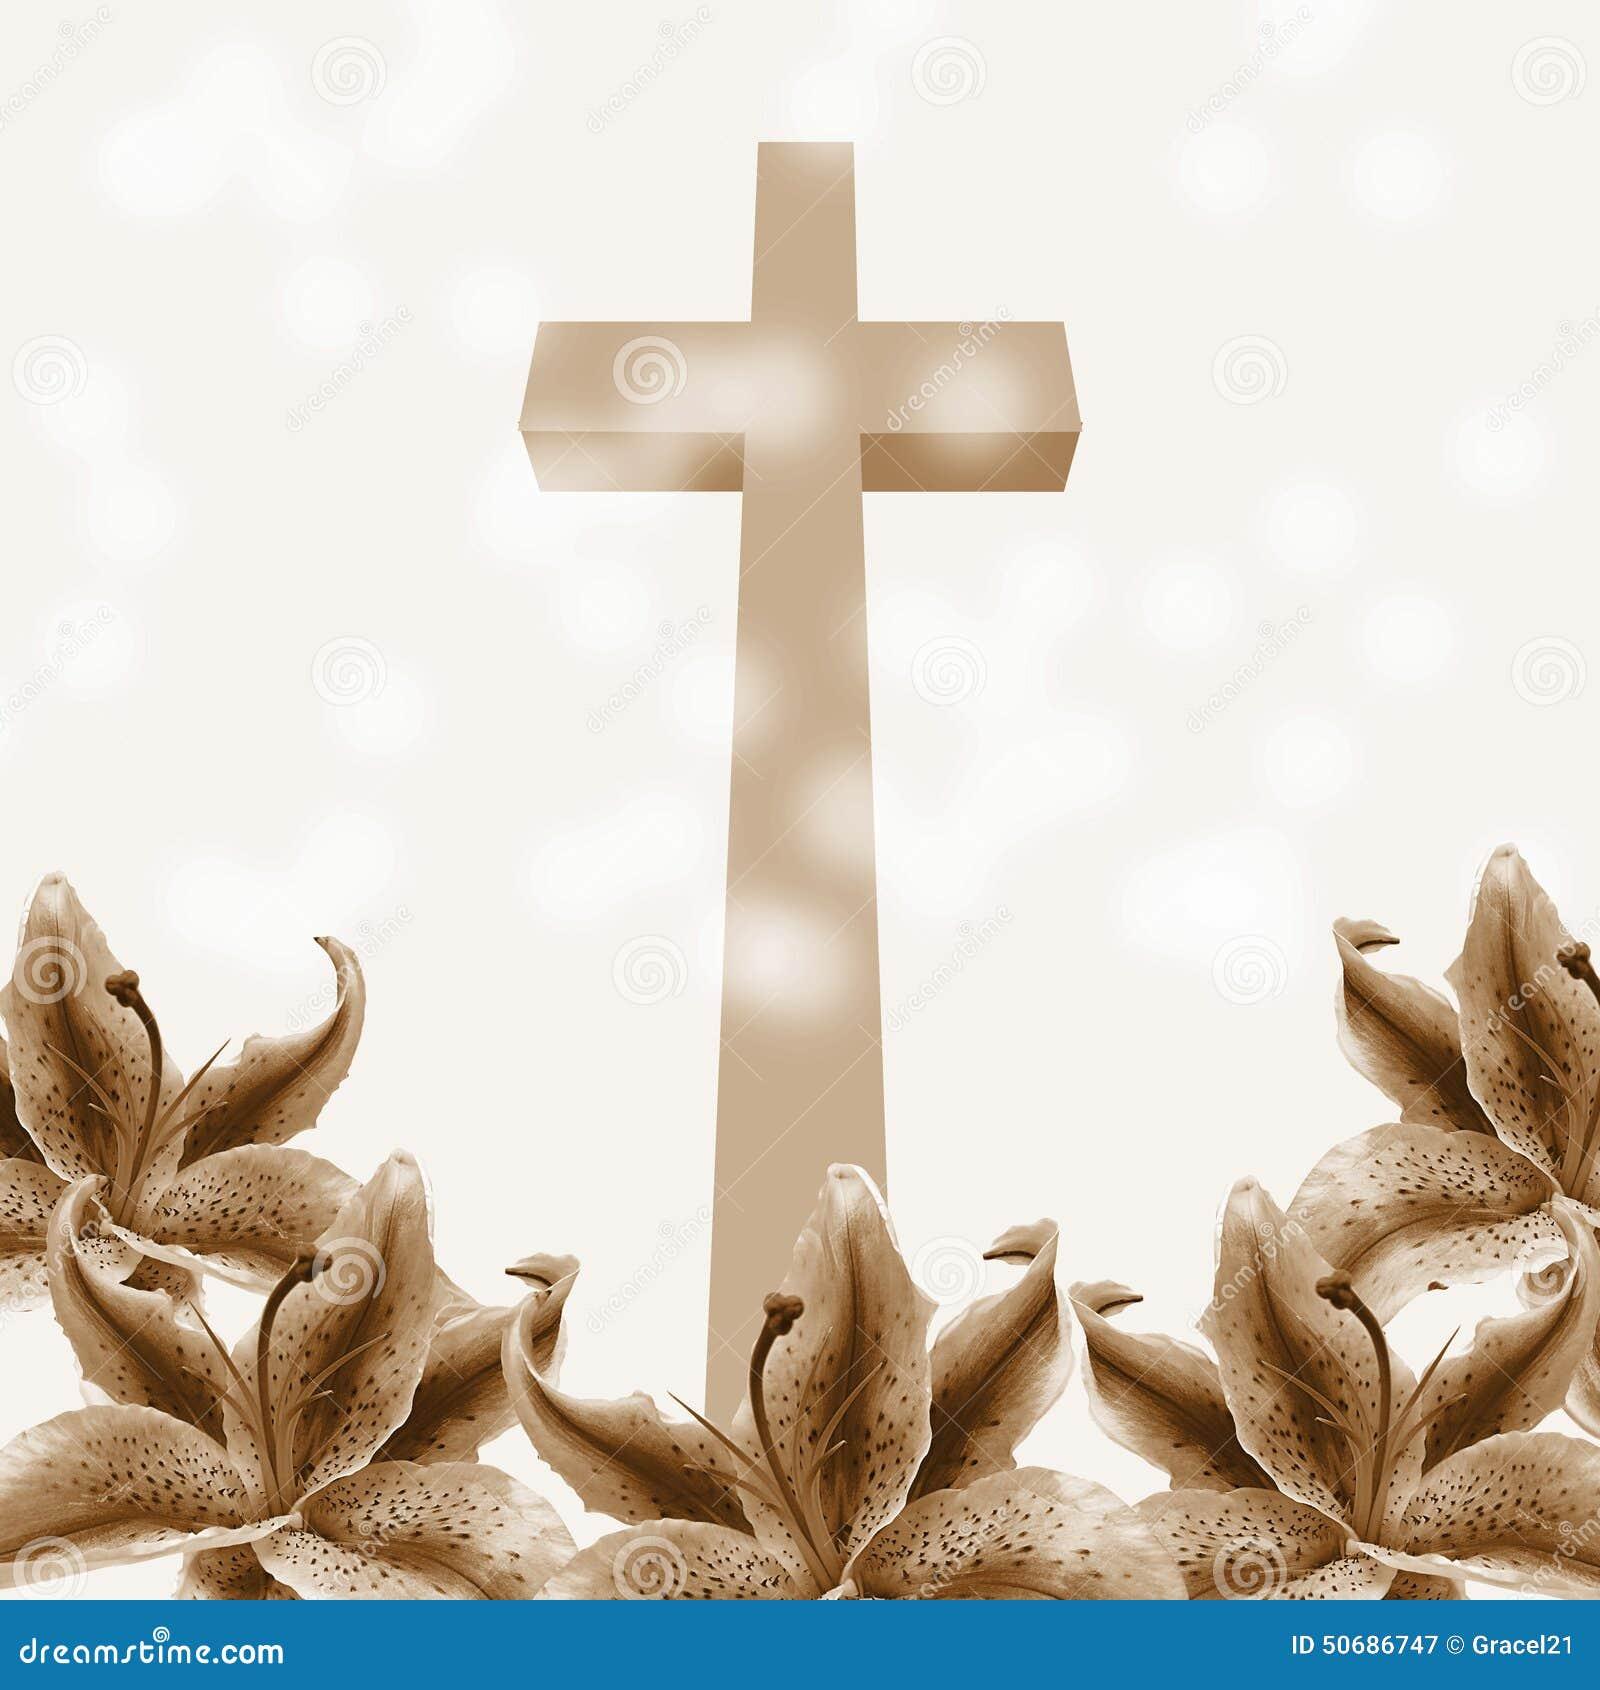 Download 基督徒十字架和百合花 库存例证. 插画 包括有 愉快, 设计, 信仰, 基督徒, 教会, 祝贺, 耶稣, beauvoir - 50686747